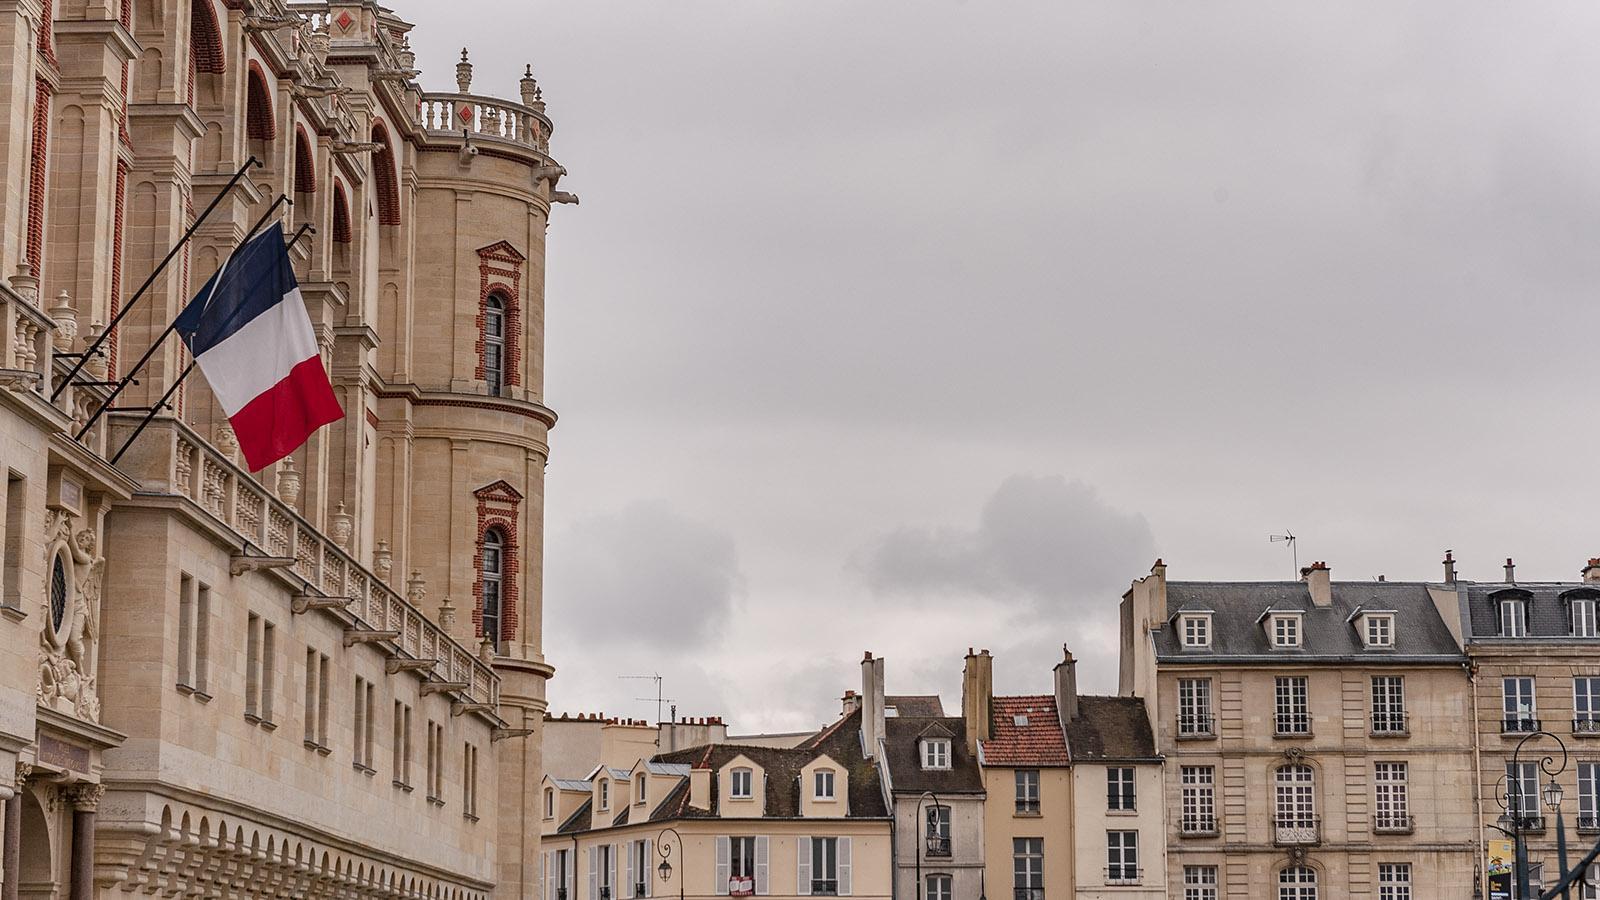 Banlieue de Paris: Saint-Germain-en-Laye. Foto: Hilke Maunder